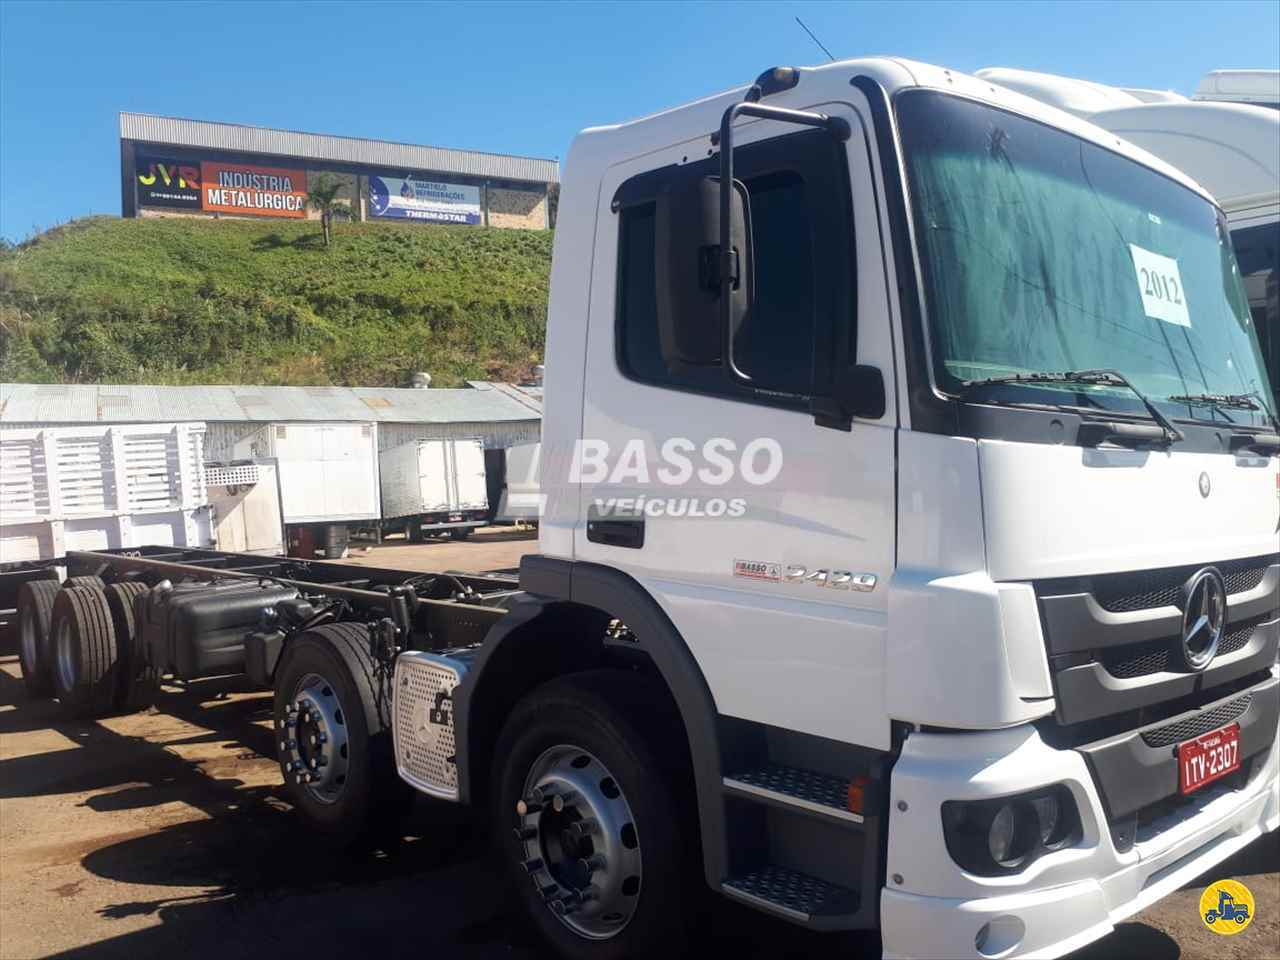 CAMINHAO MERCEDES-BENZ MB 2429 Chassis BiTruck 8x2 Basso Veículos GARIBALDI RIO GRANDE DO SUL RS